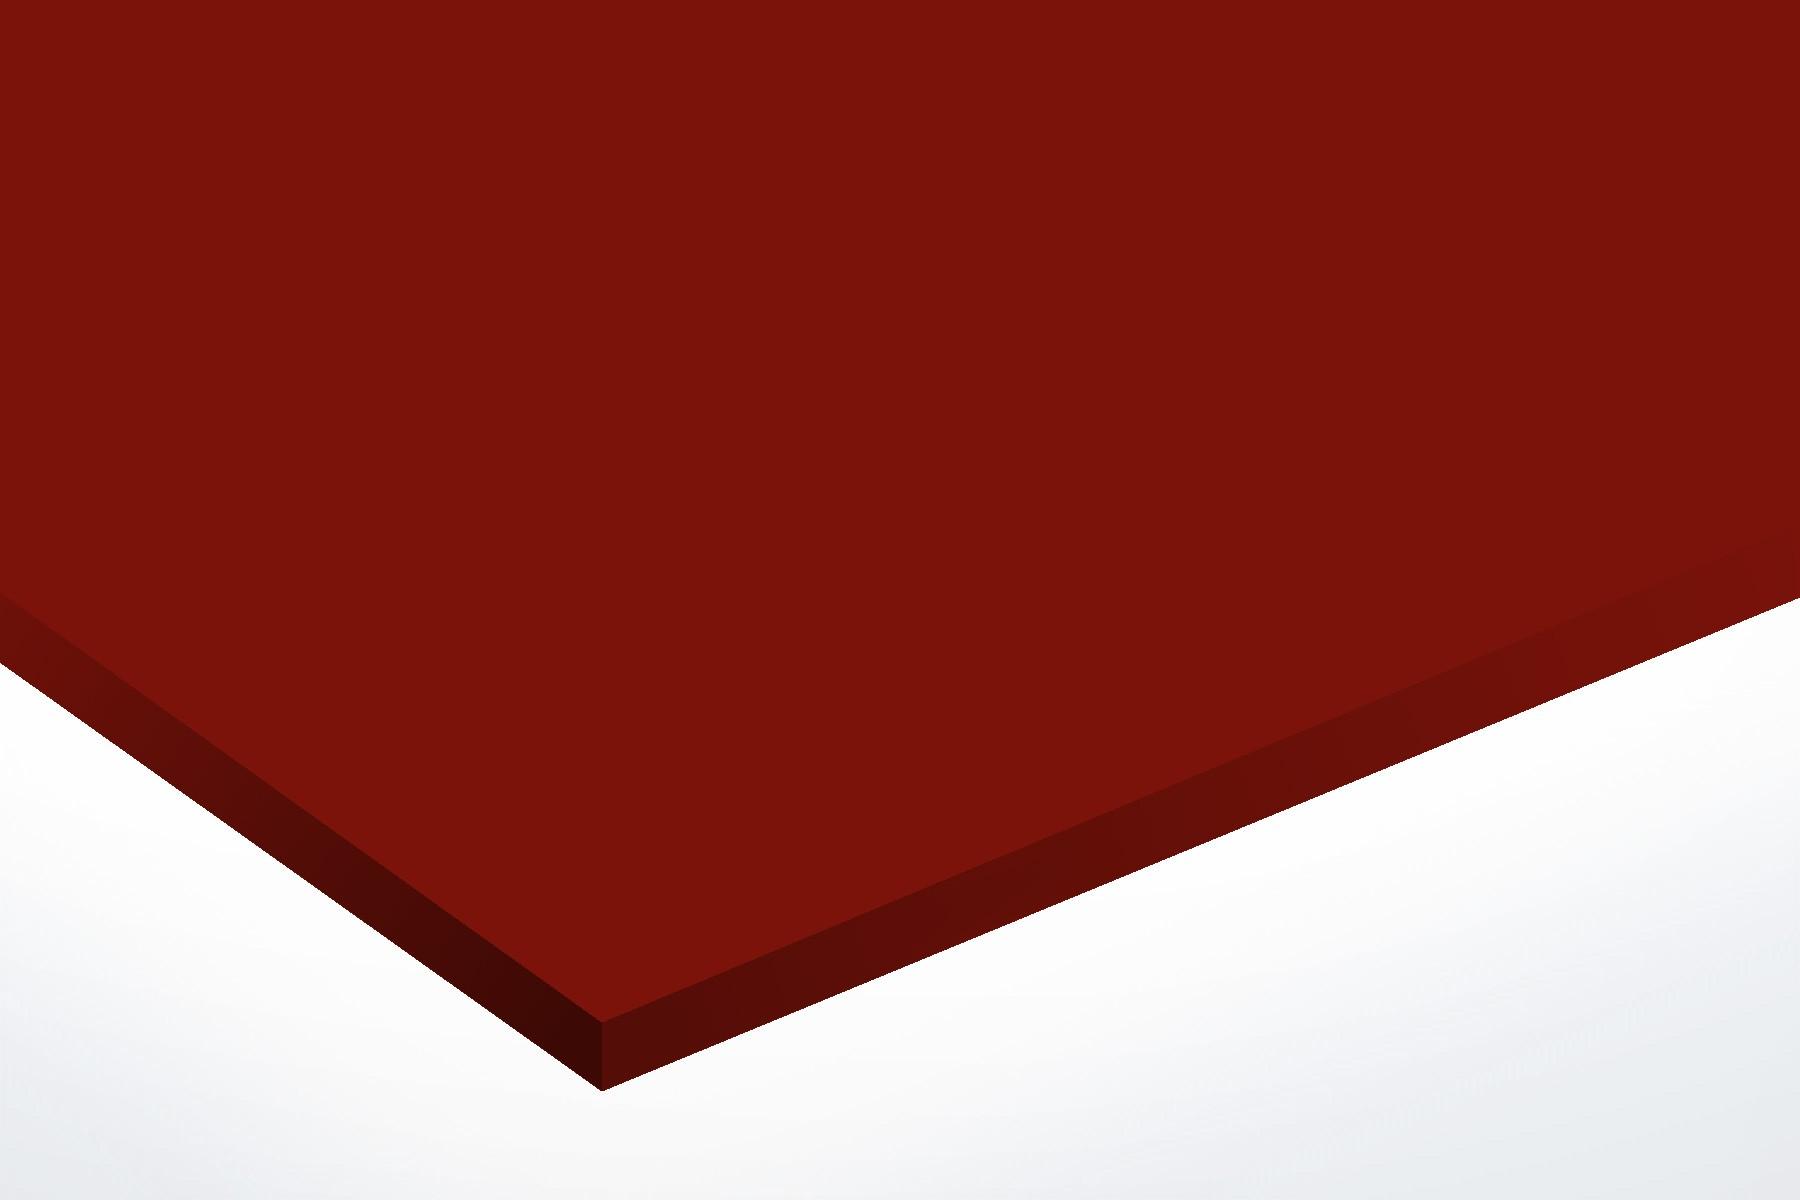 Anodised Aluminium Red, Matt, 1mm x 1000mm x 500mm